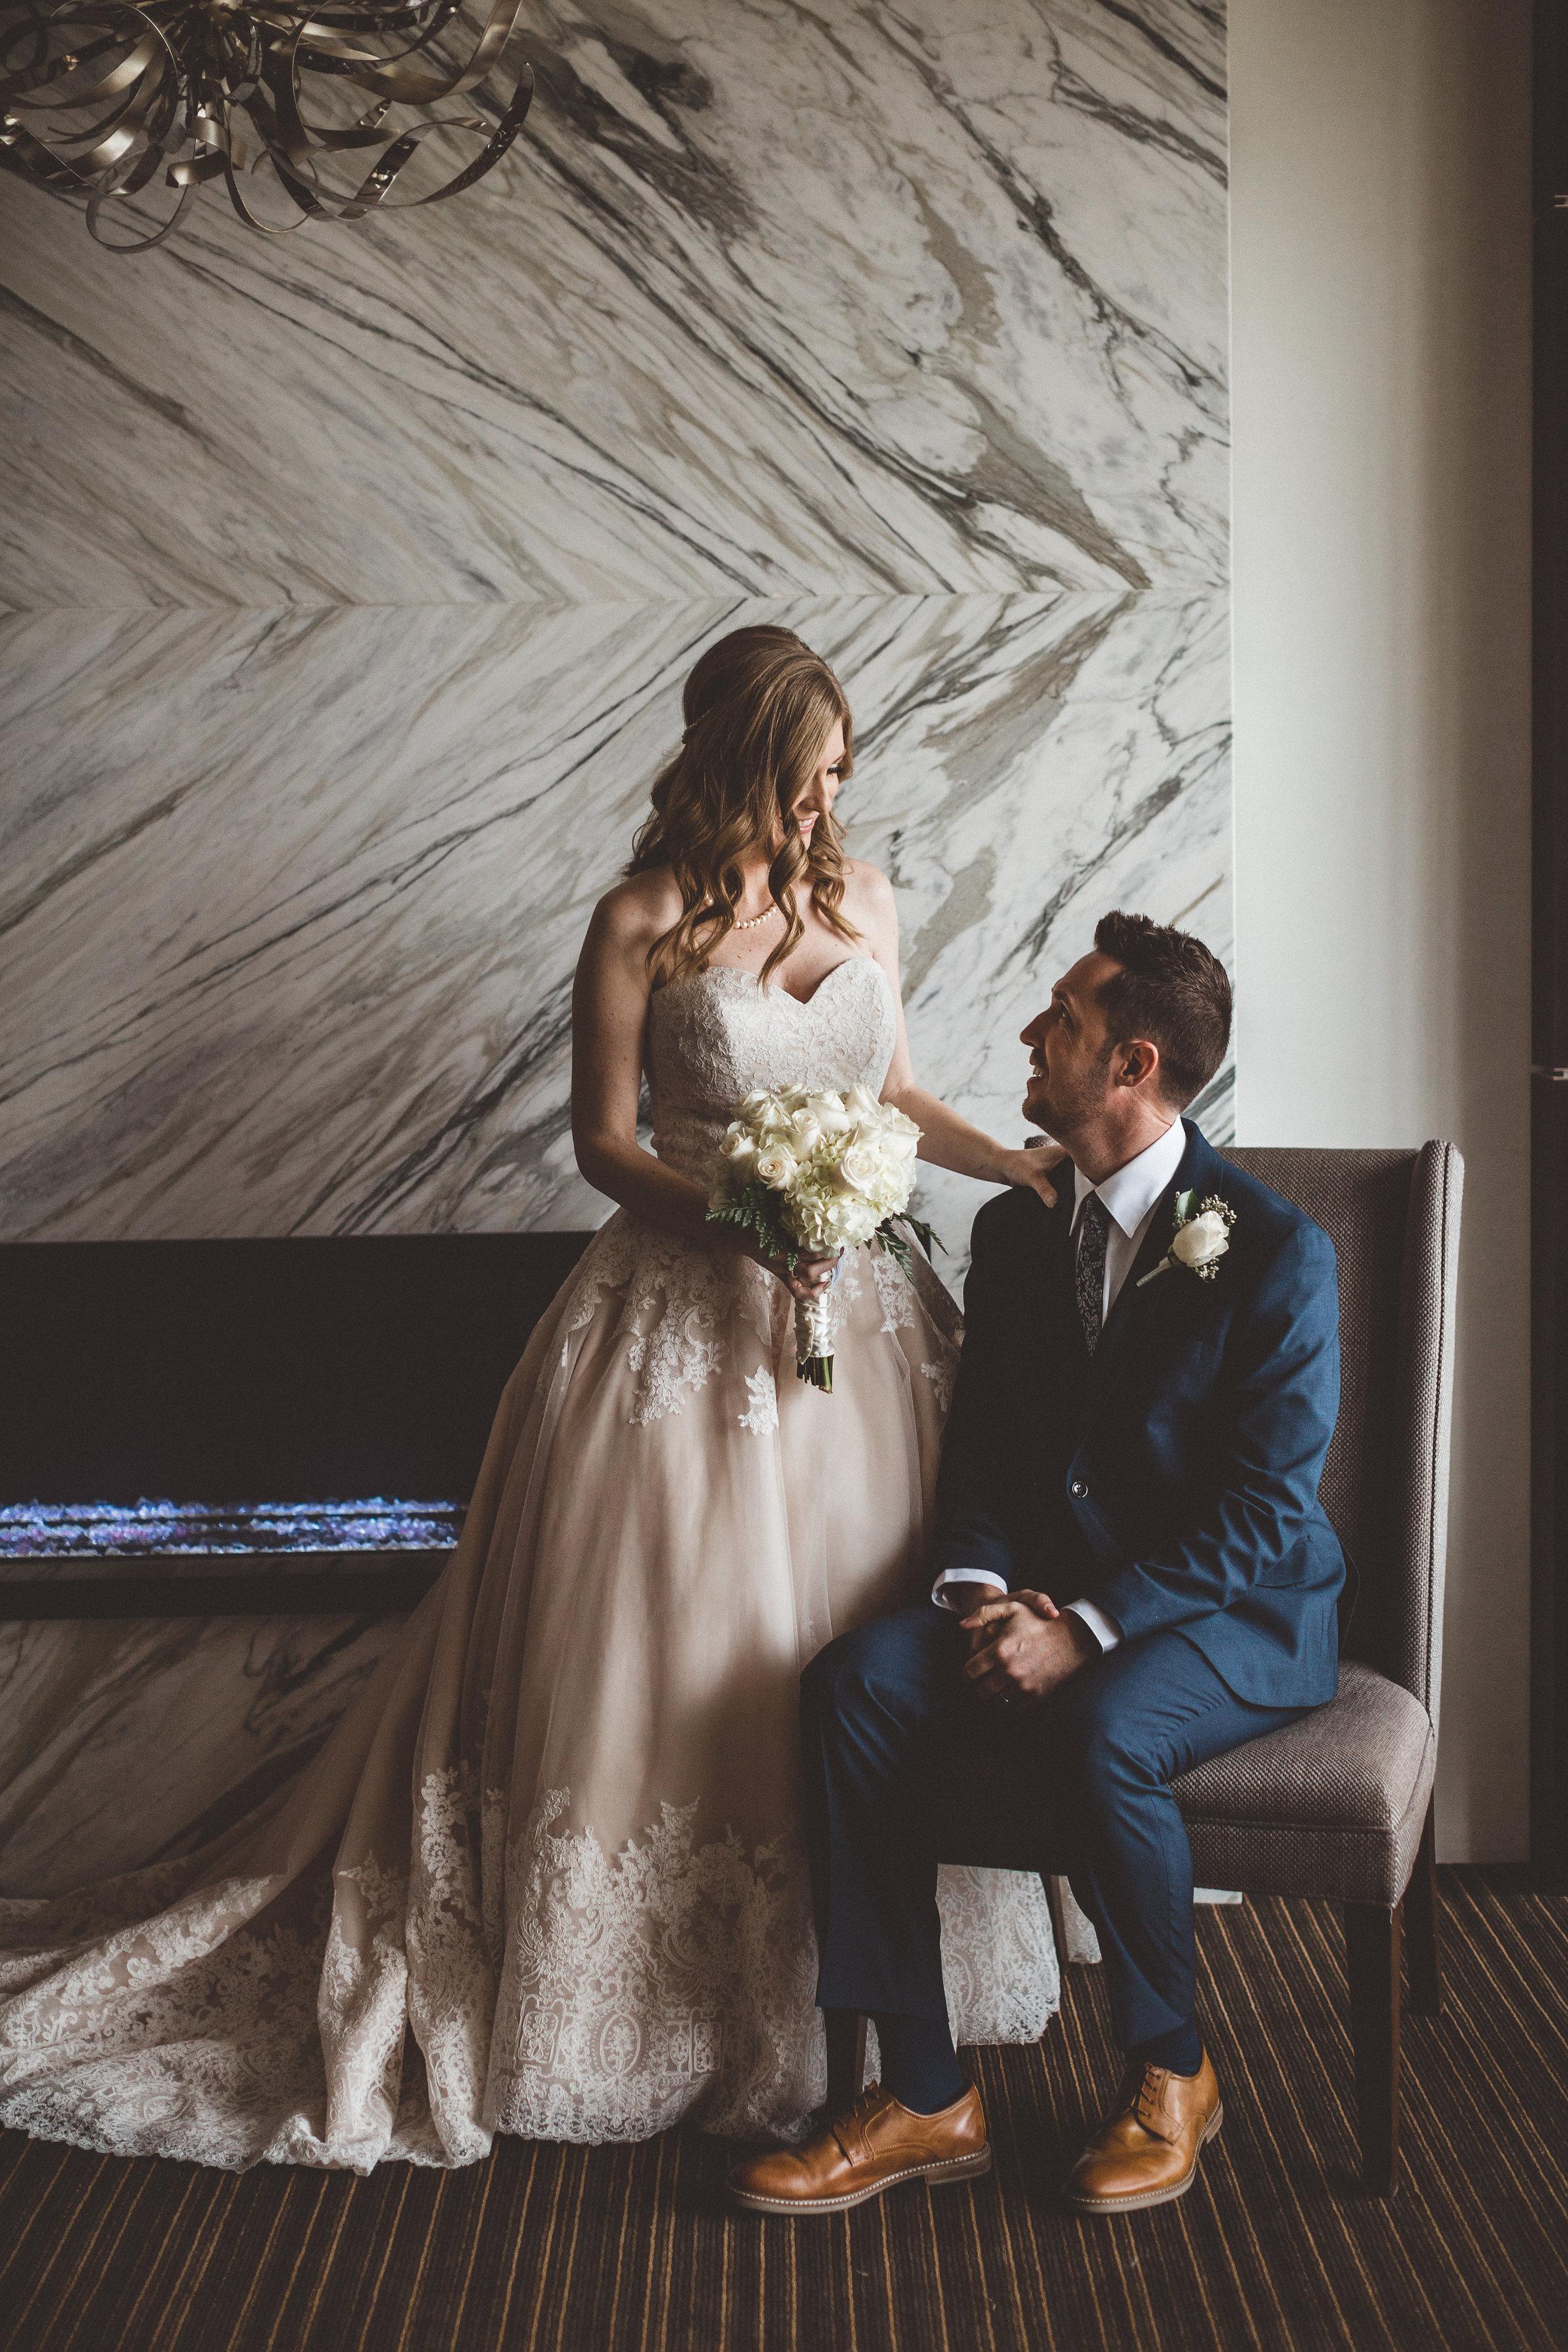 lindsey-and-ryan-intimate-winter-wedding34.jpg